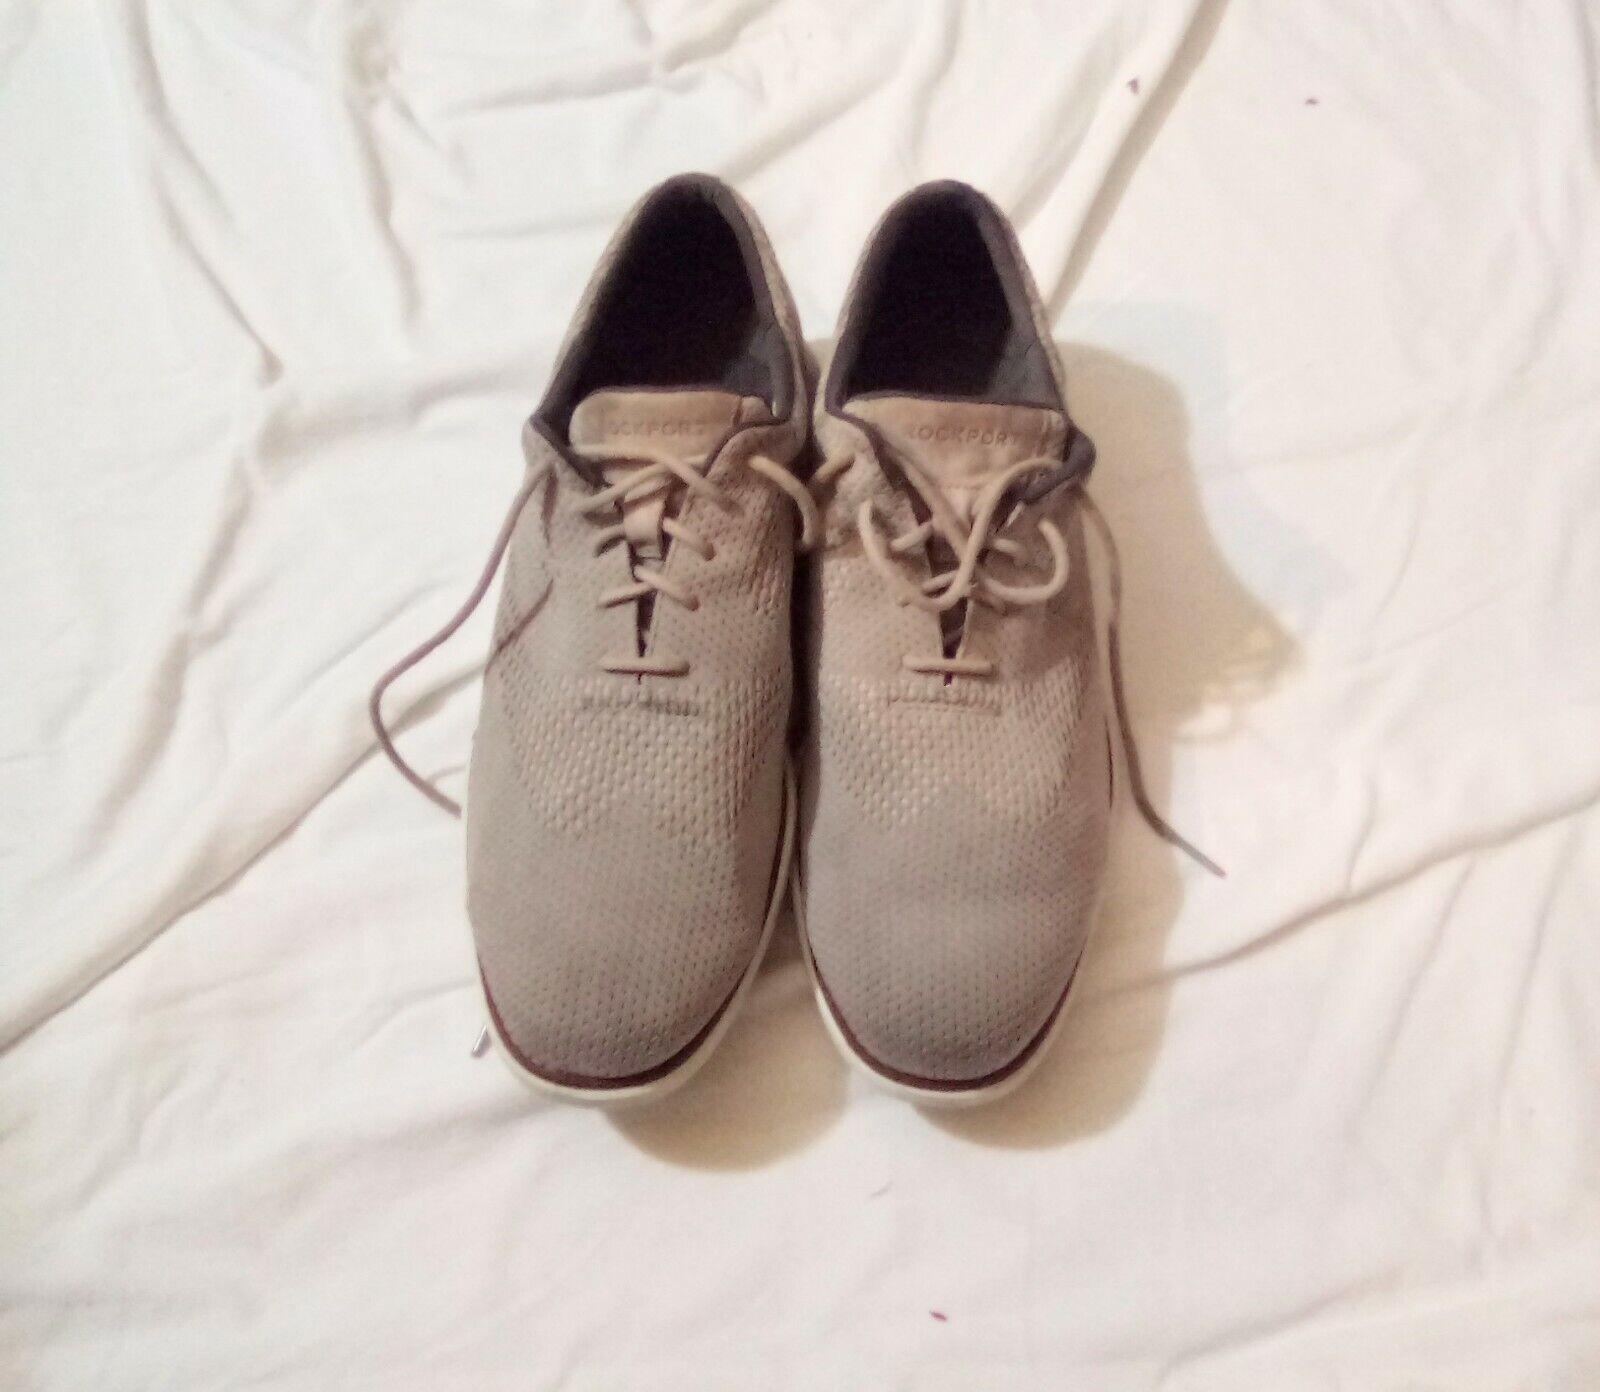 Bruno marc mens shoes 12